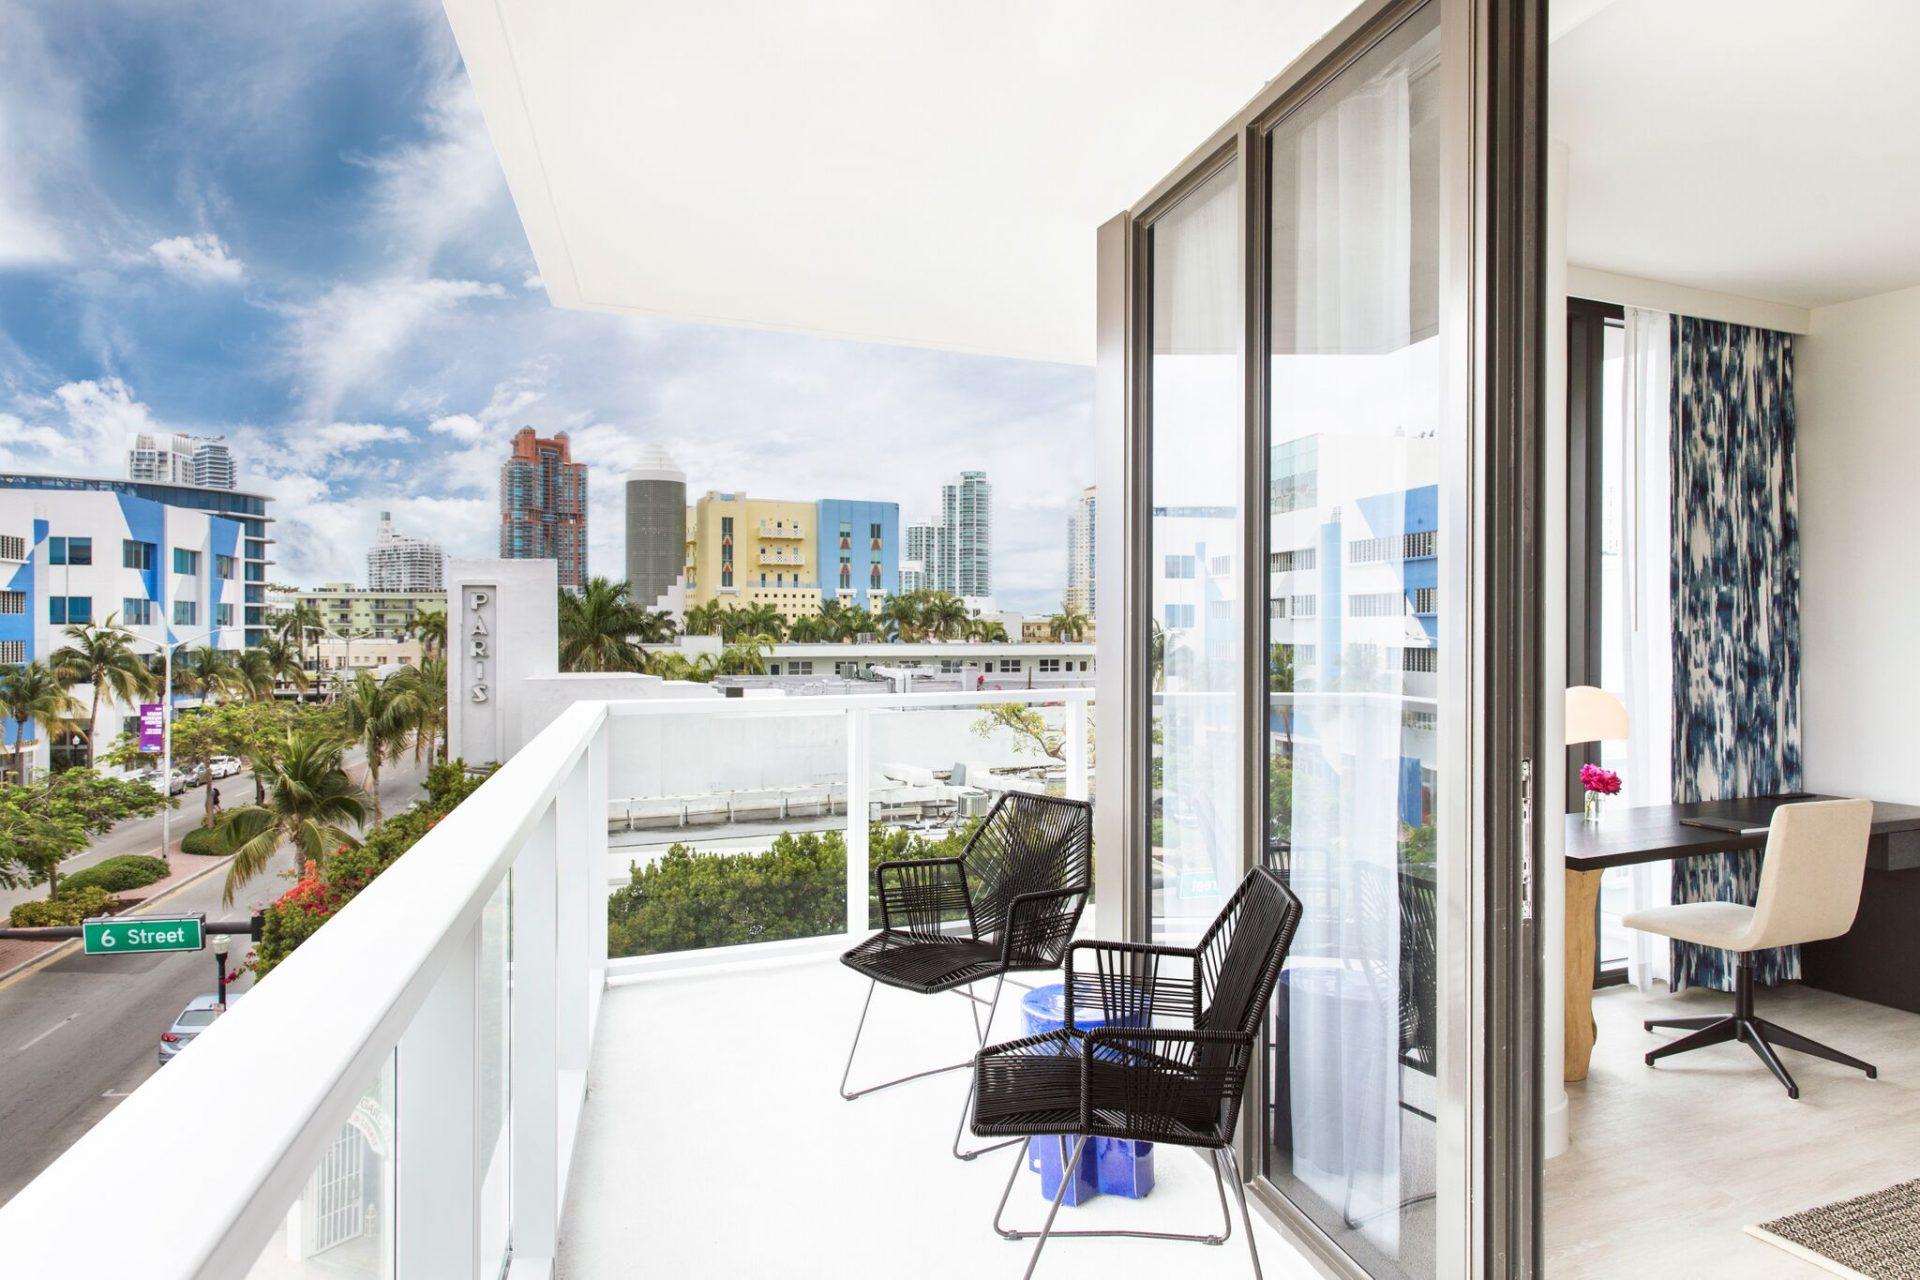 Kimpton Angler's Hotel South Beach, refugio de relajación